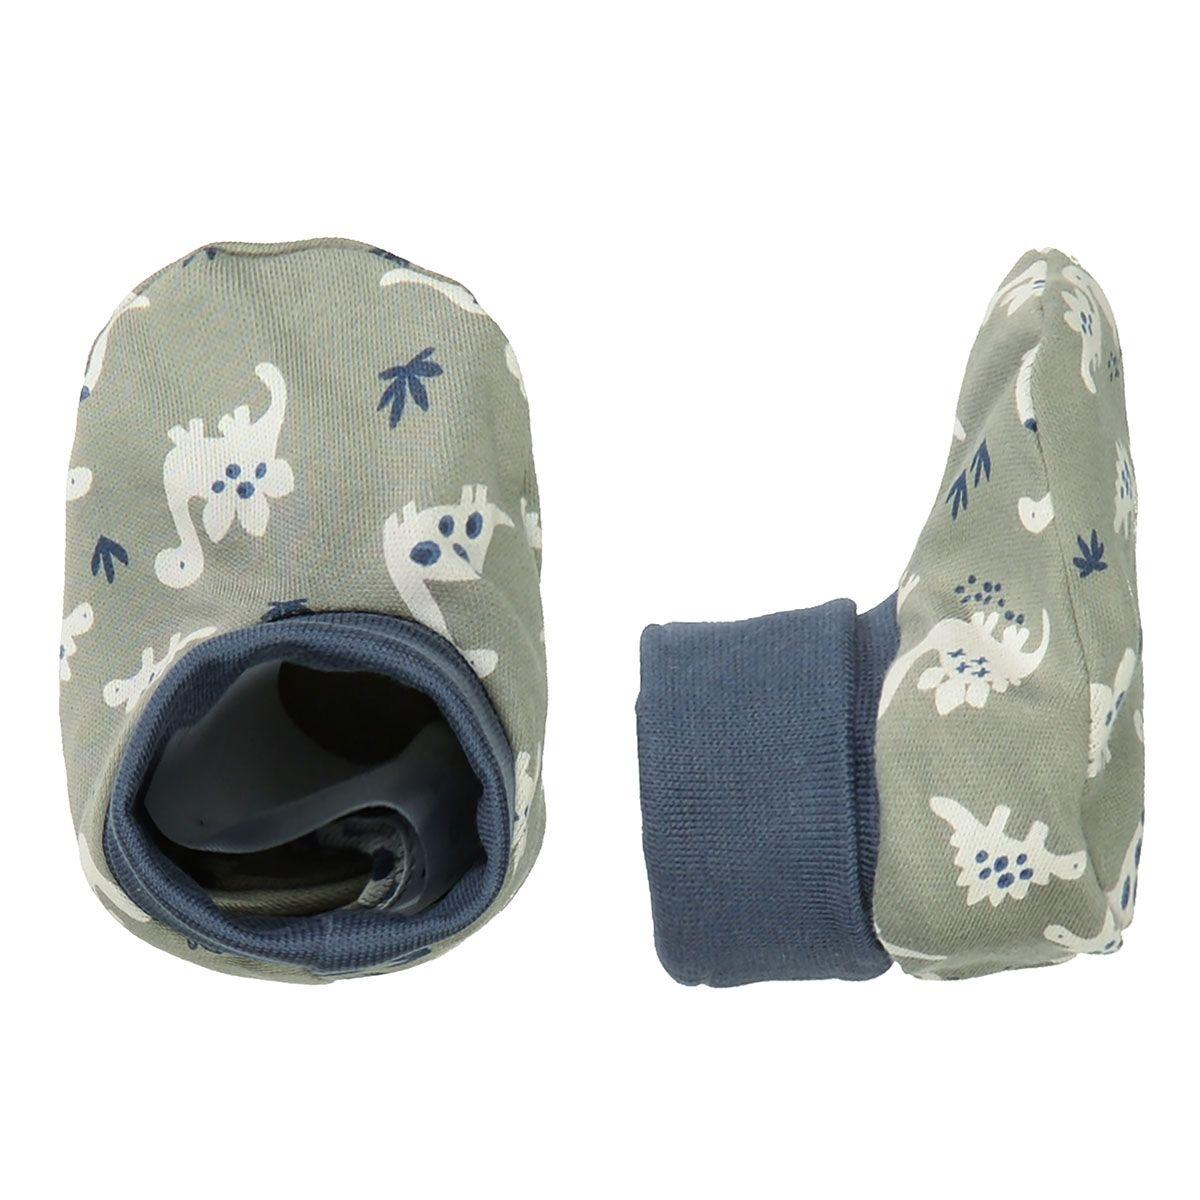 ORGANIC COTTON Baby Schuhe - Olive AOP